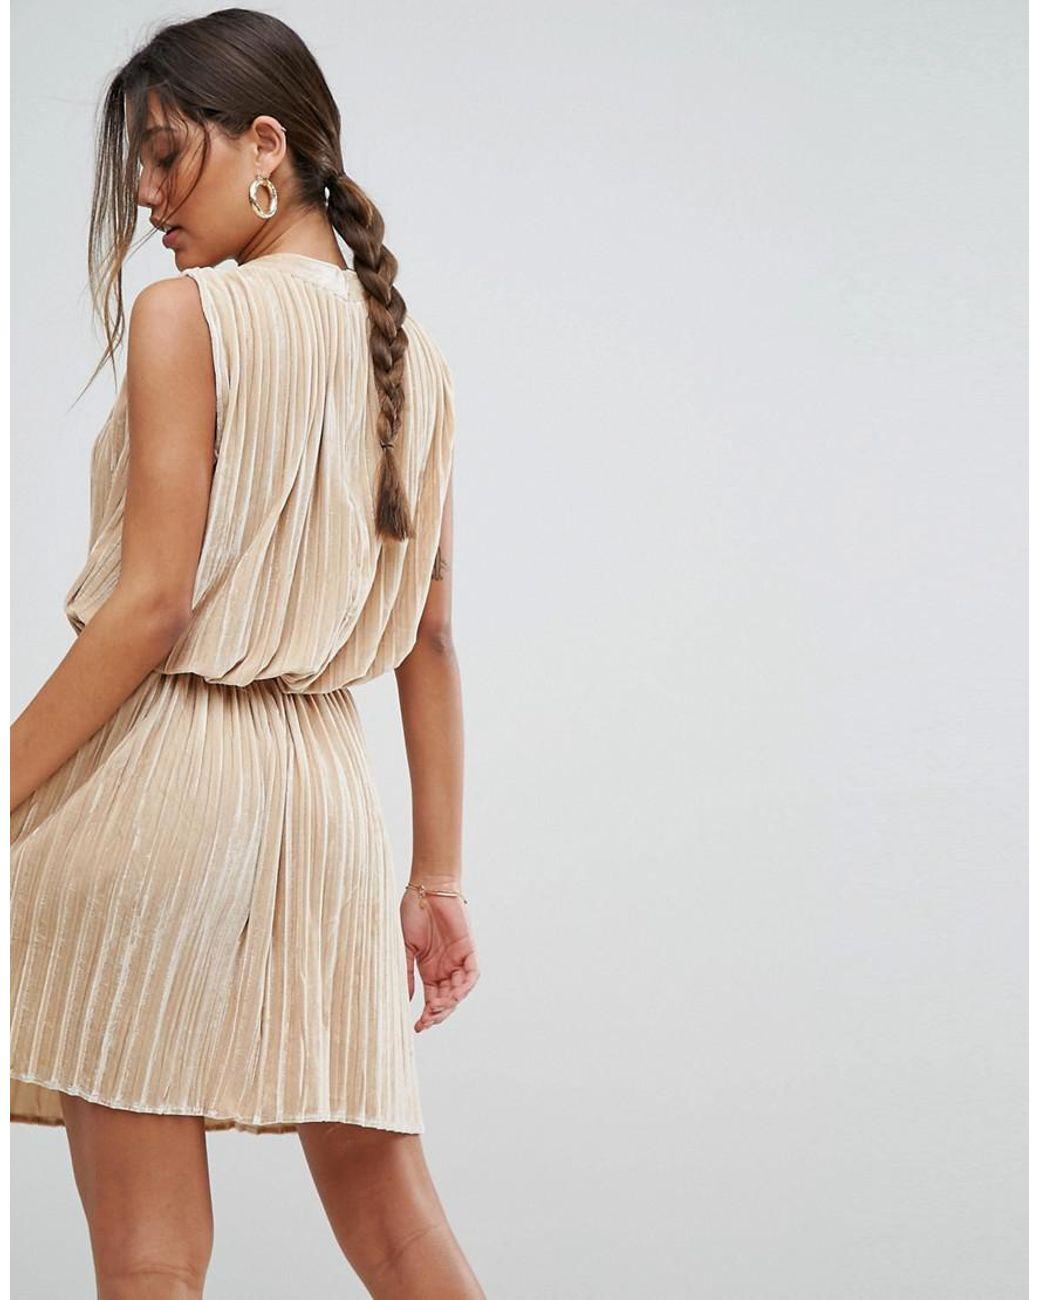 a03304bd03d Aeryne Sleeveless Velvet Pleated Dress in Metallic - Lyst